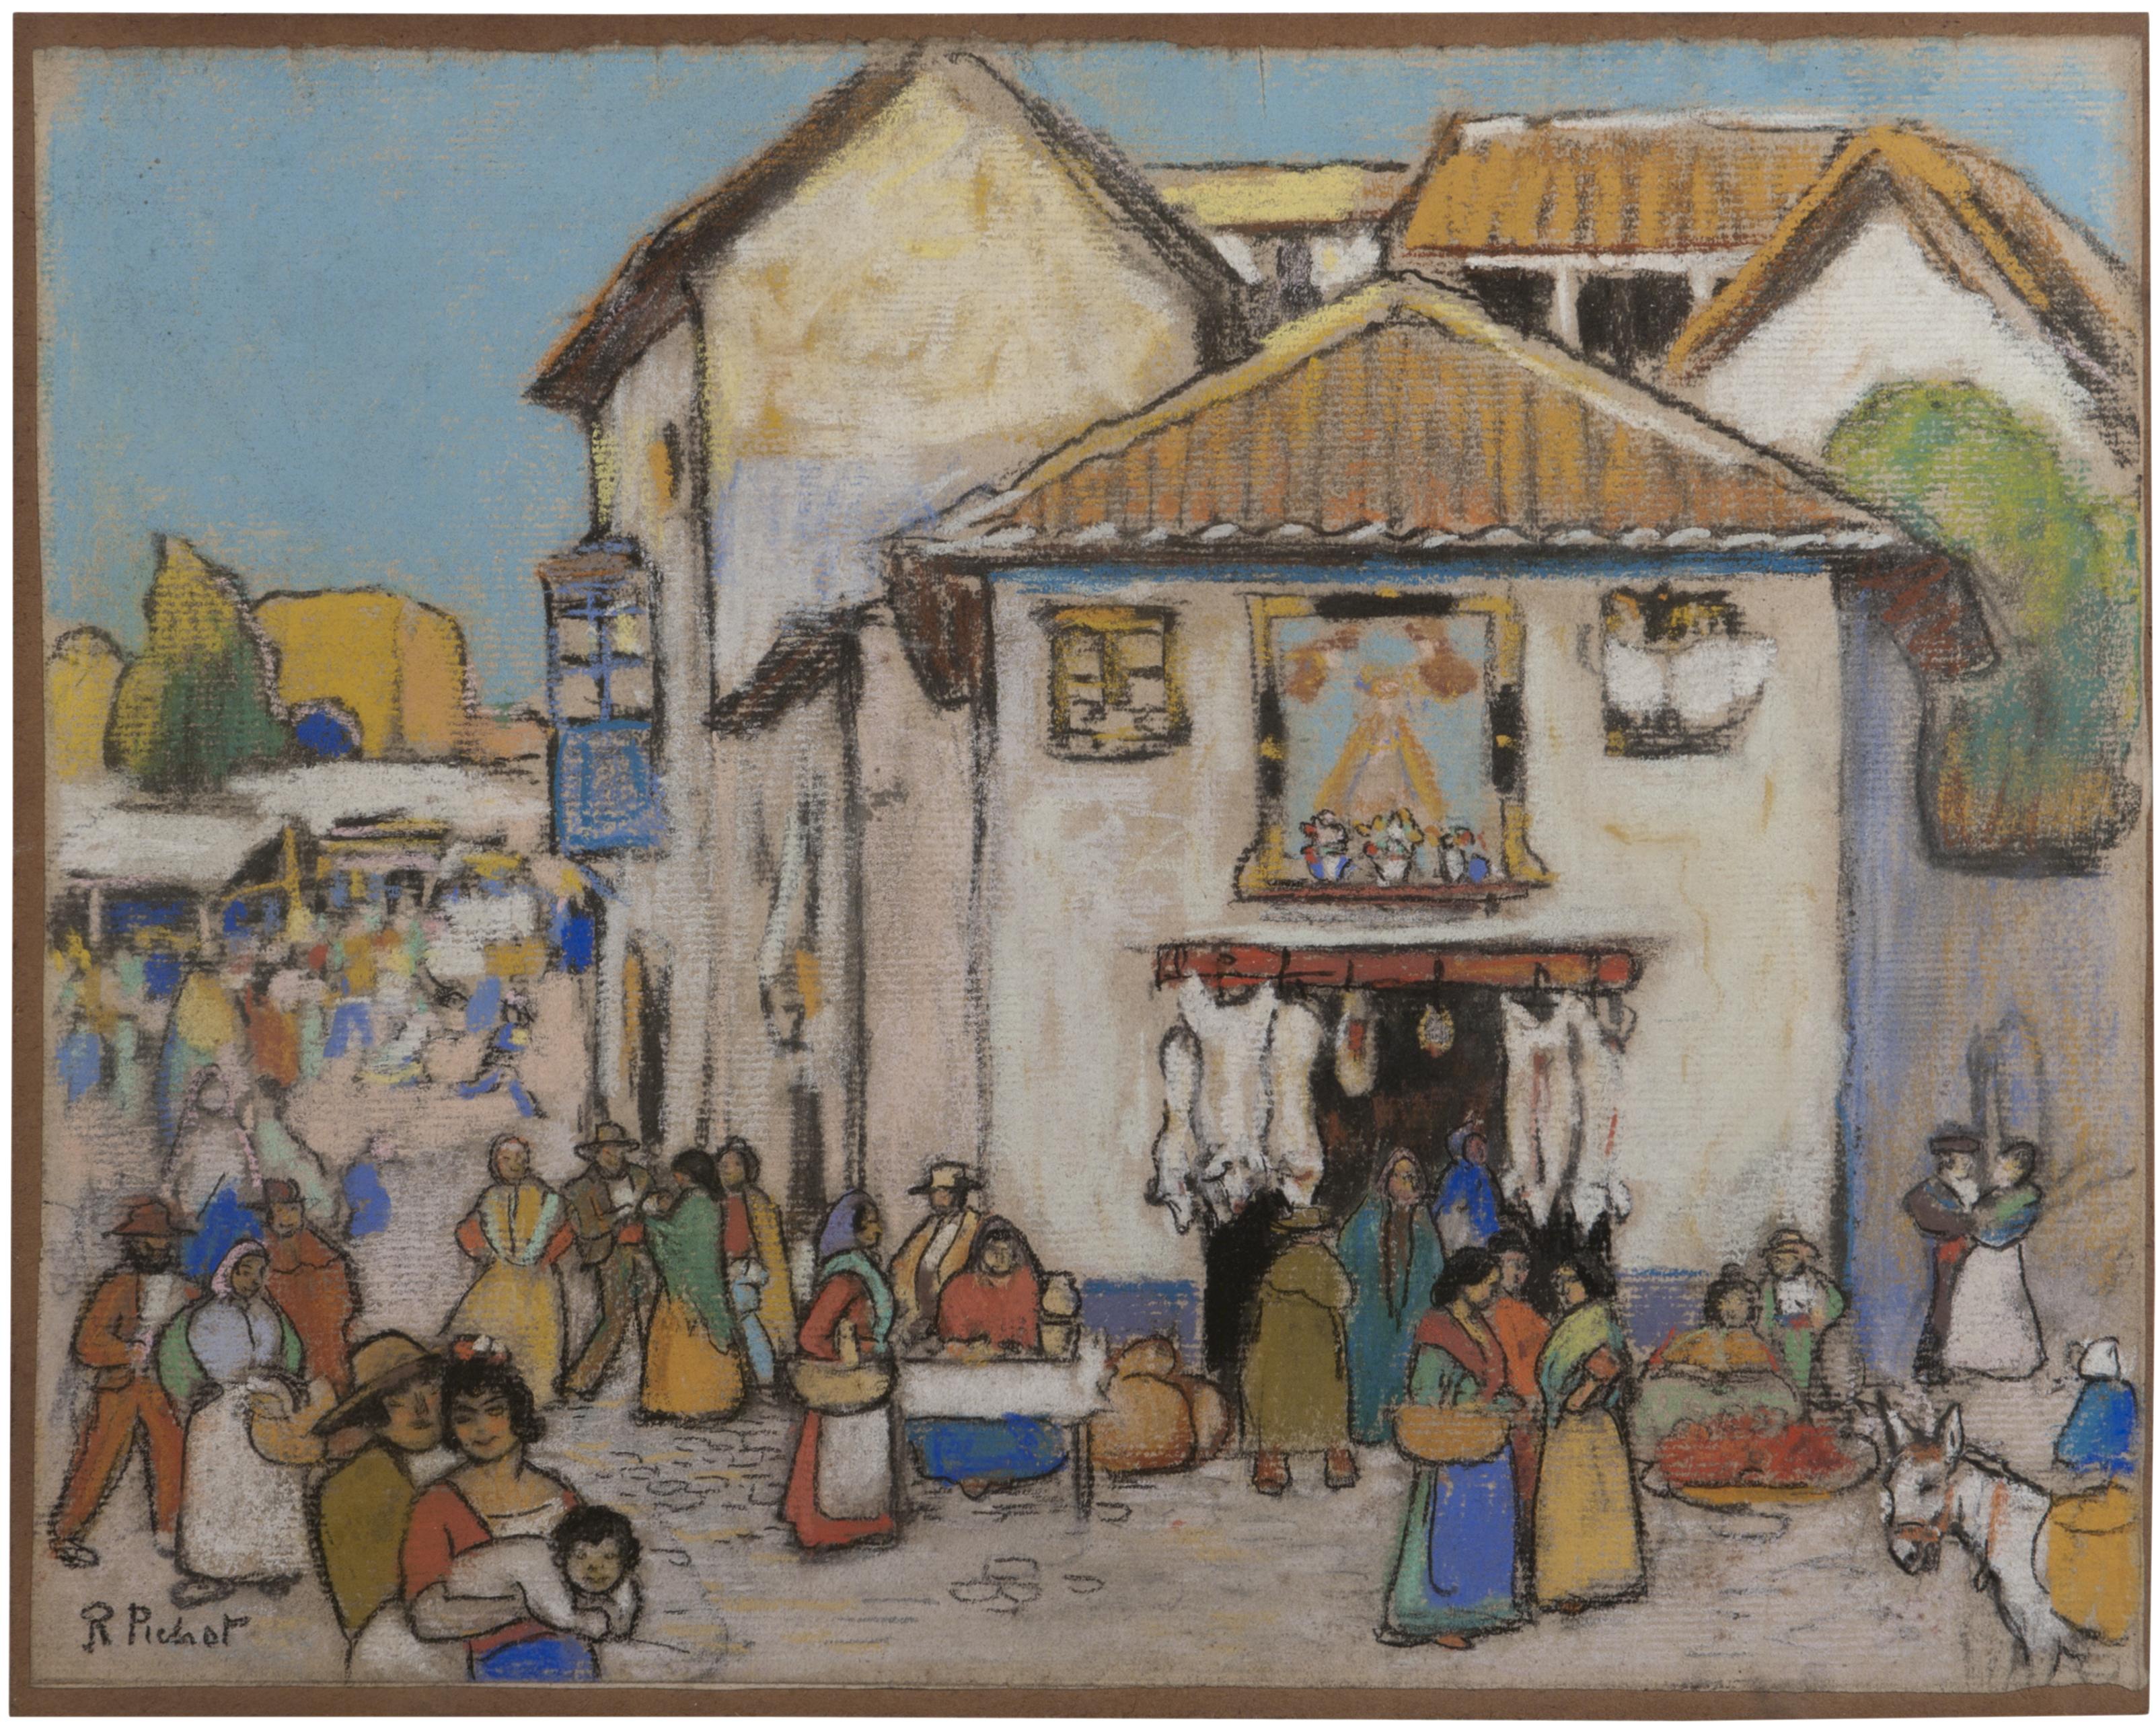 Ramon Pichot Gironés - Mercat - Entre 1906 i 1911 [1]